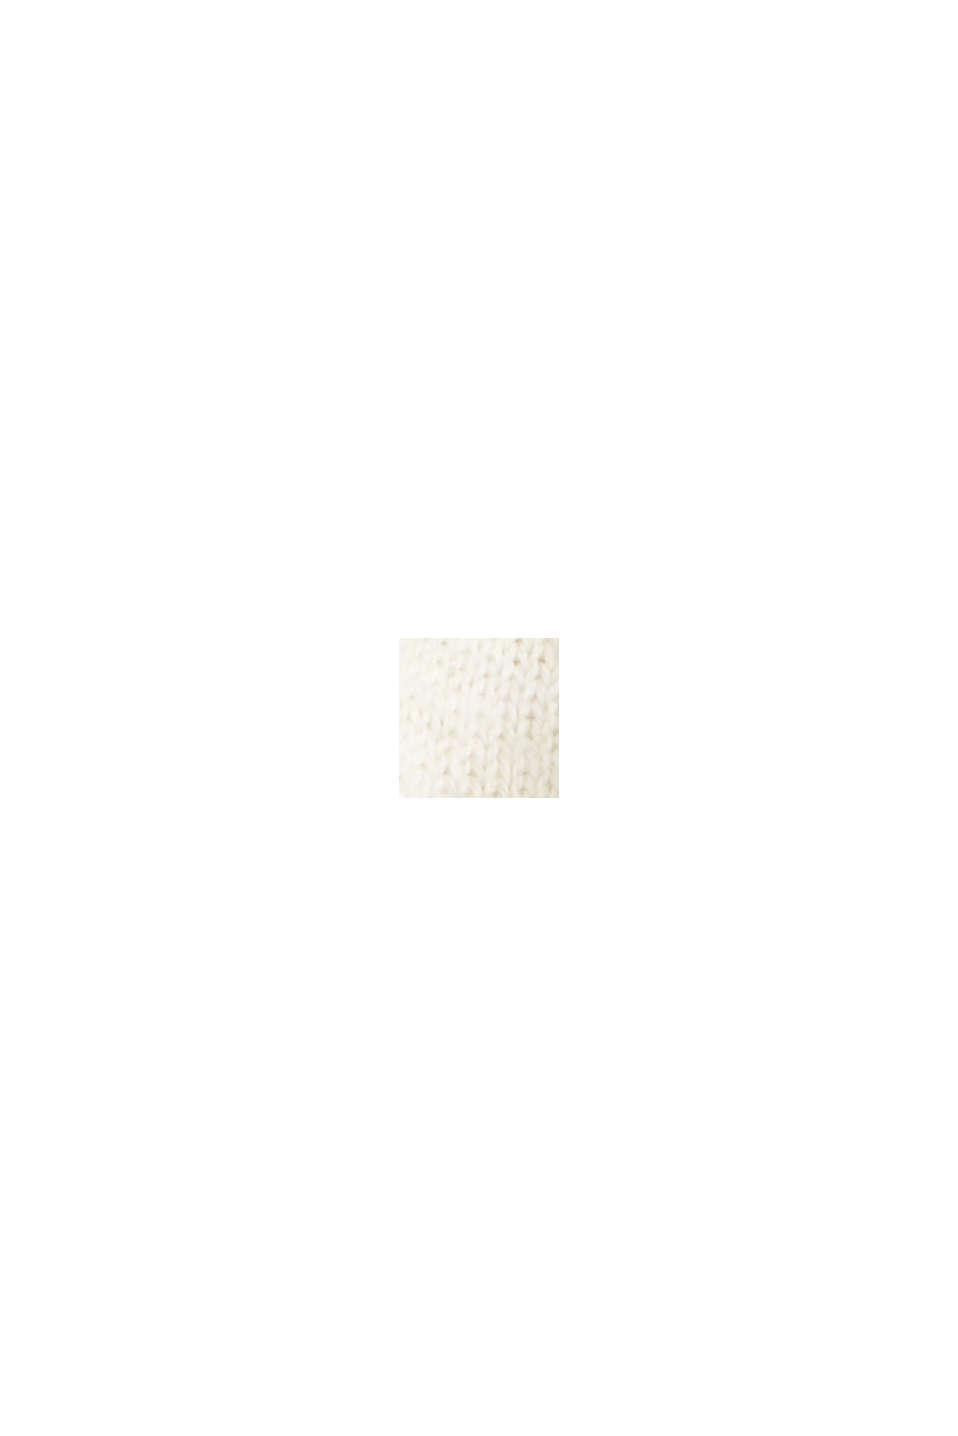 Jersey realizado en 100% algodón ecológico, OFF WHITE, swatch